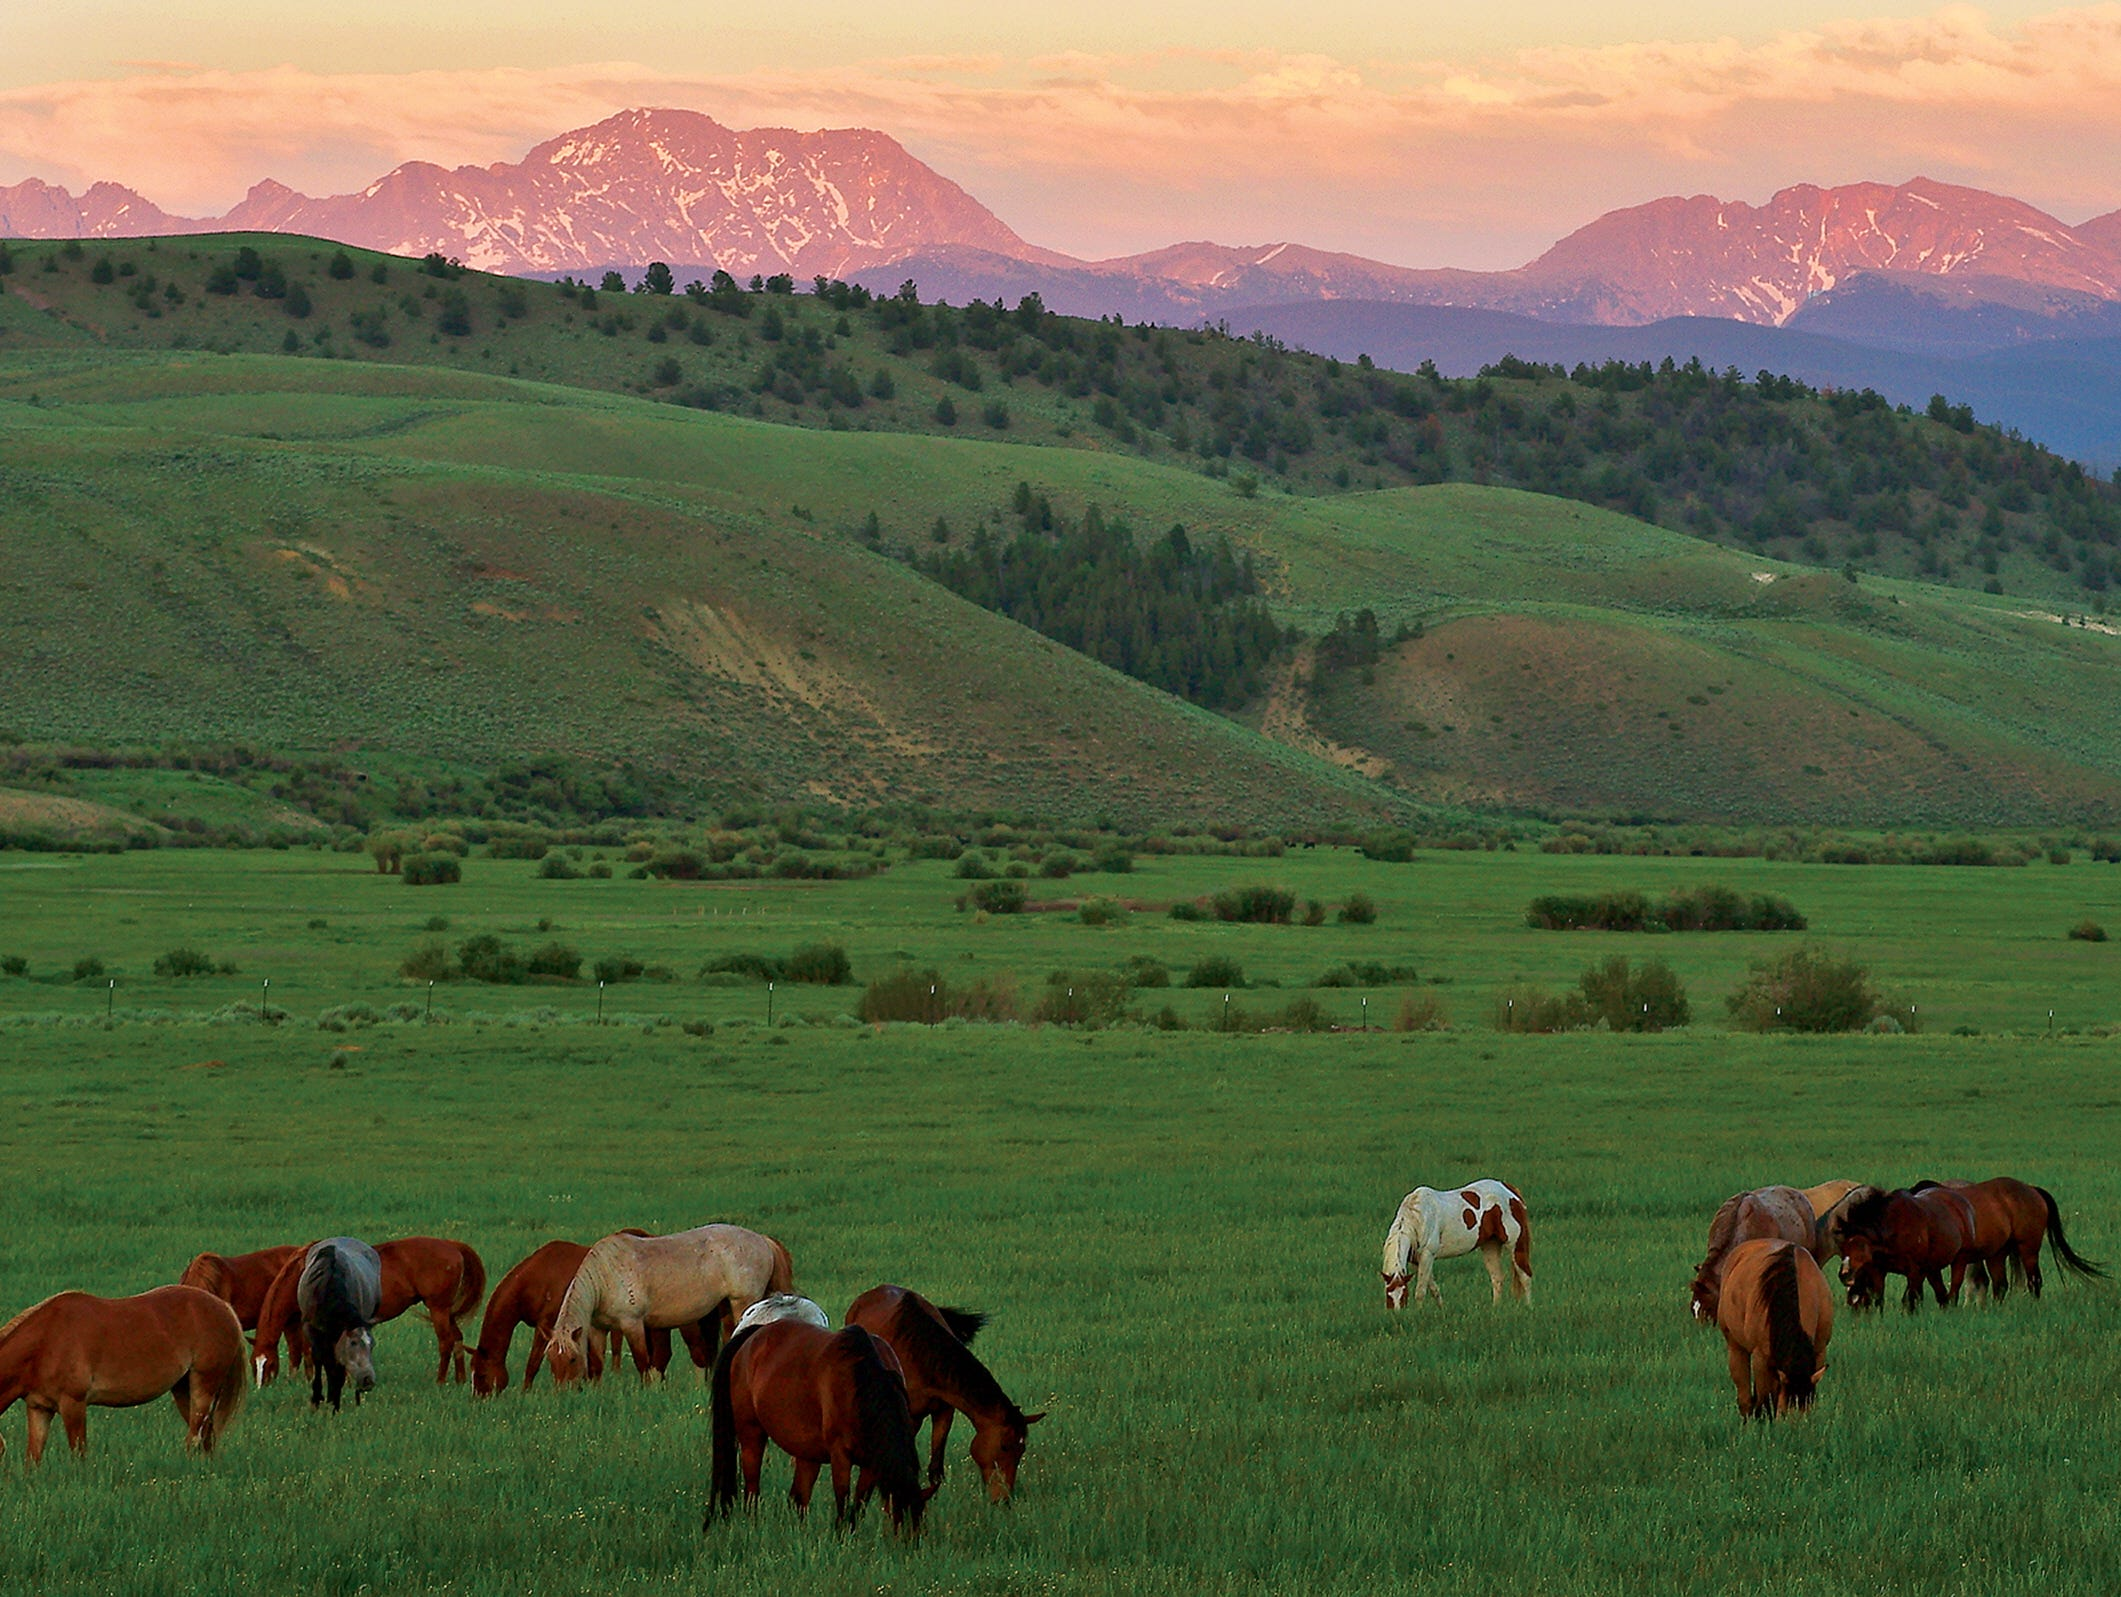 http://www.ranchland.com